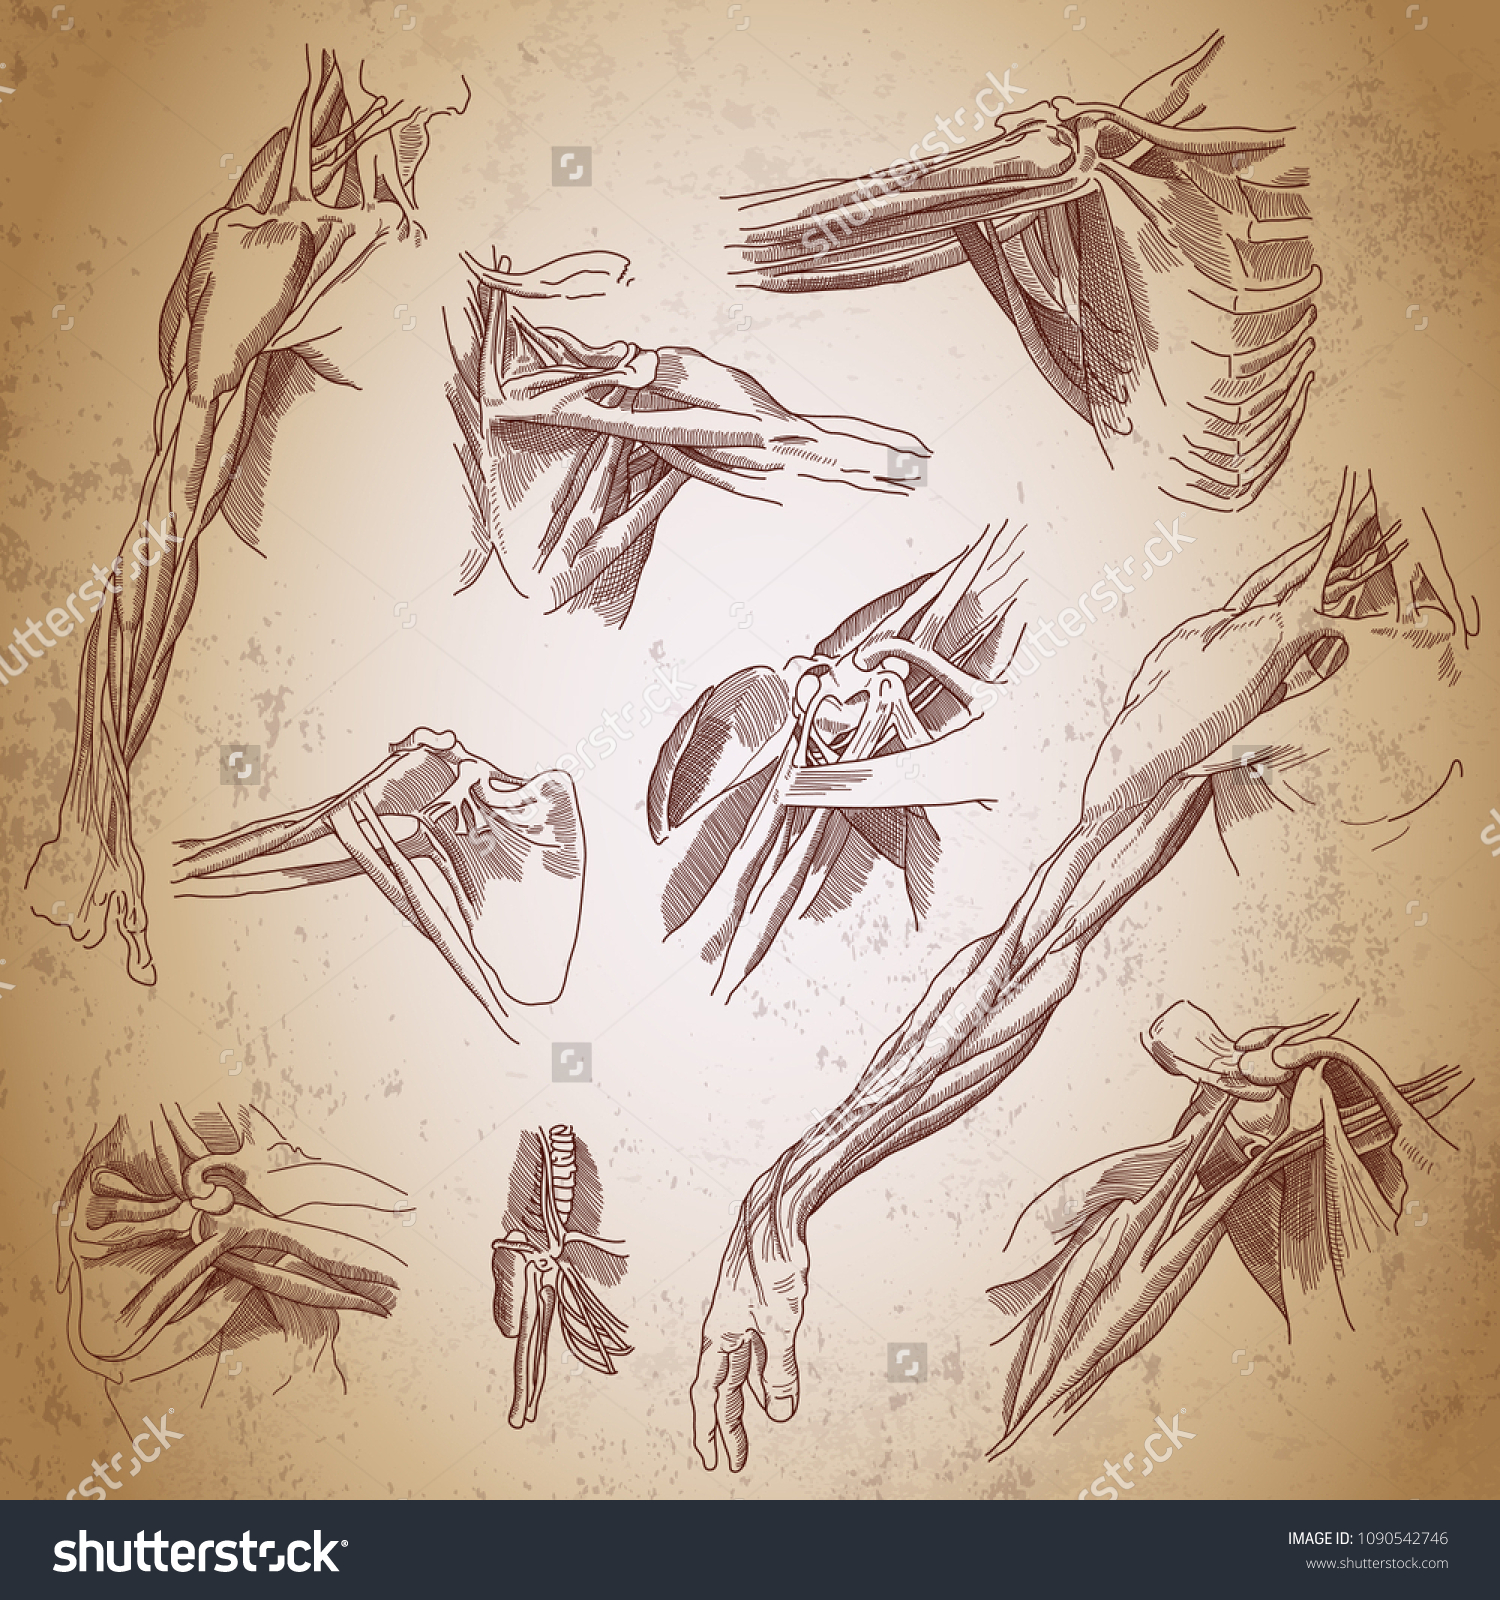 Leonardo Da Vinci Sketches Three Studies Stock Vector (Royalty Free ...